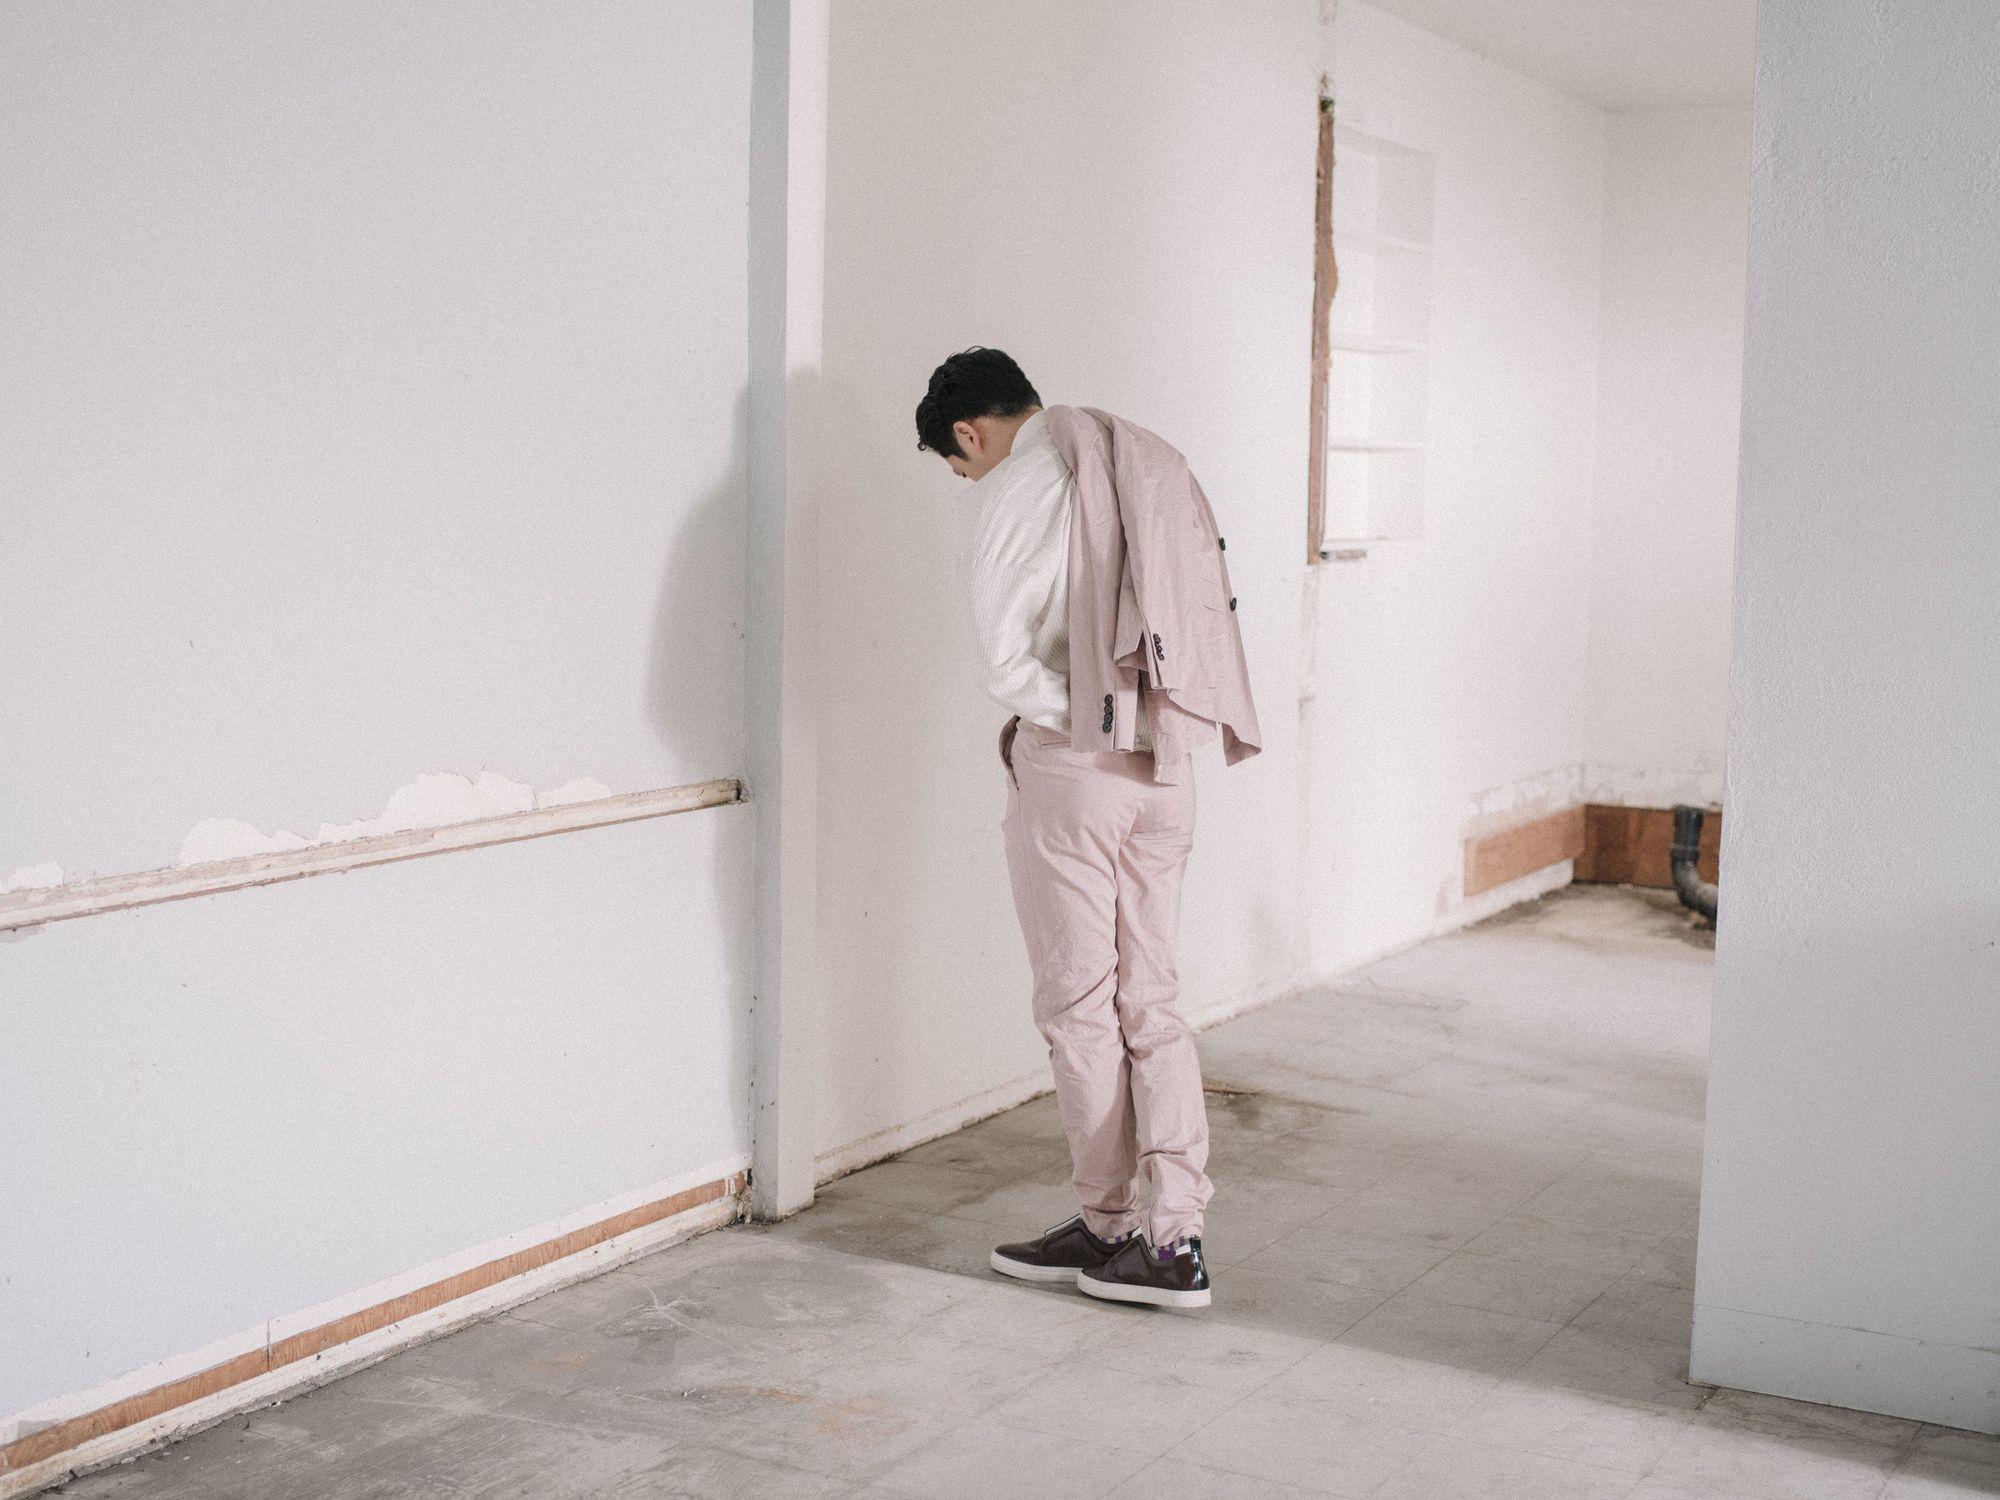 Photo of Steven Yeun from FLAUNT Magazine, shot by Shane Mccauley